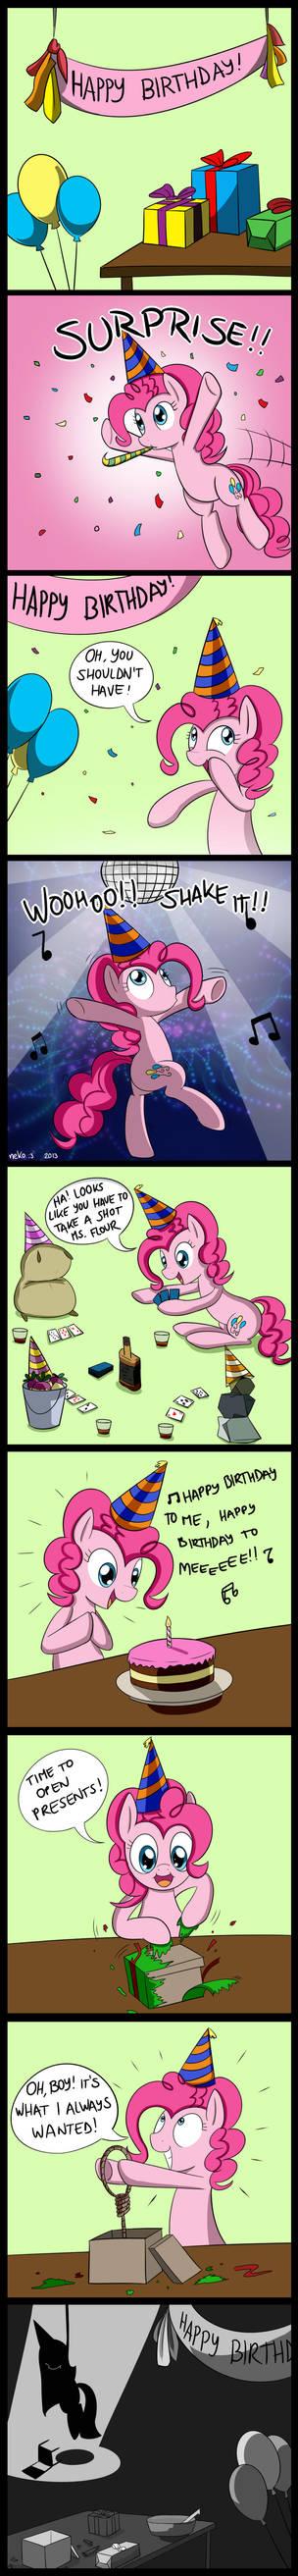 Happy Birthday to me! by McSadat